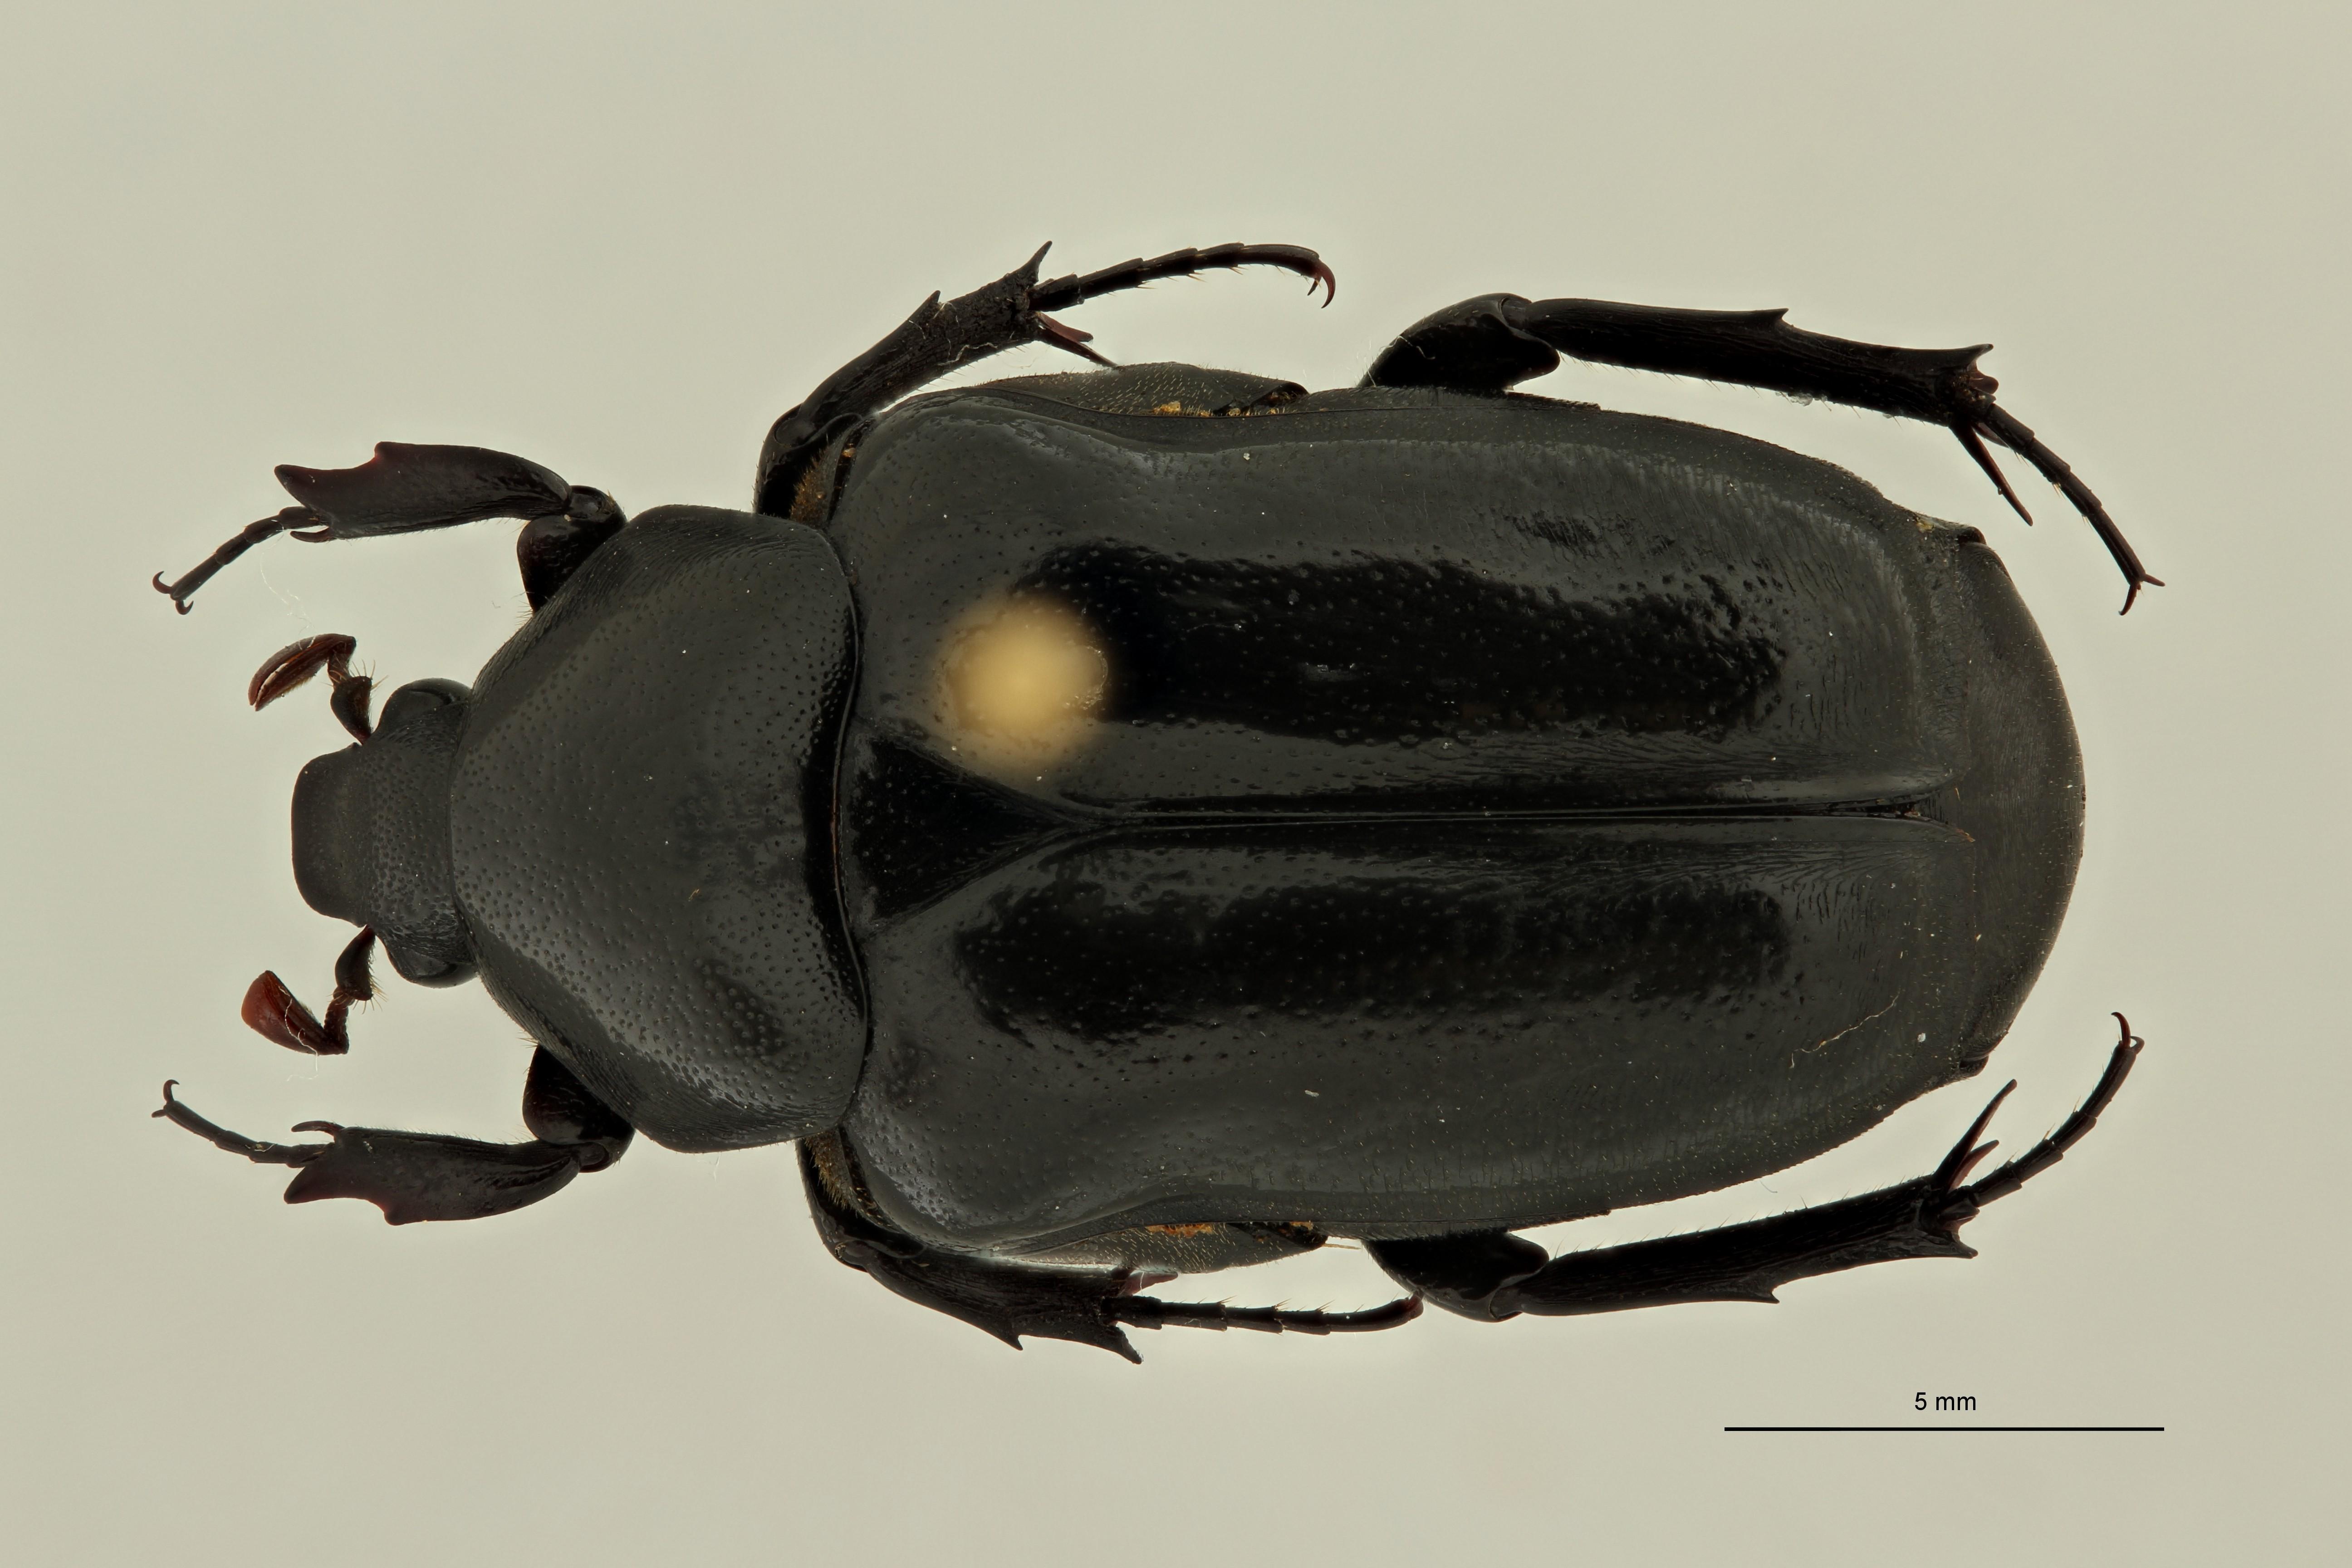 Oplostomus pectoralis morettoi pt2 D ZS PMax Scaled.jpeg